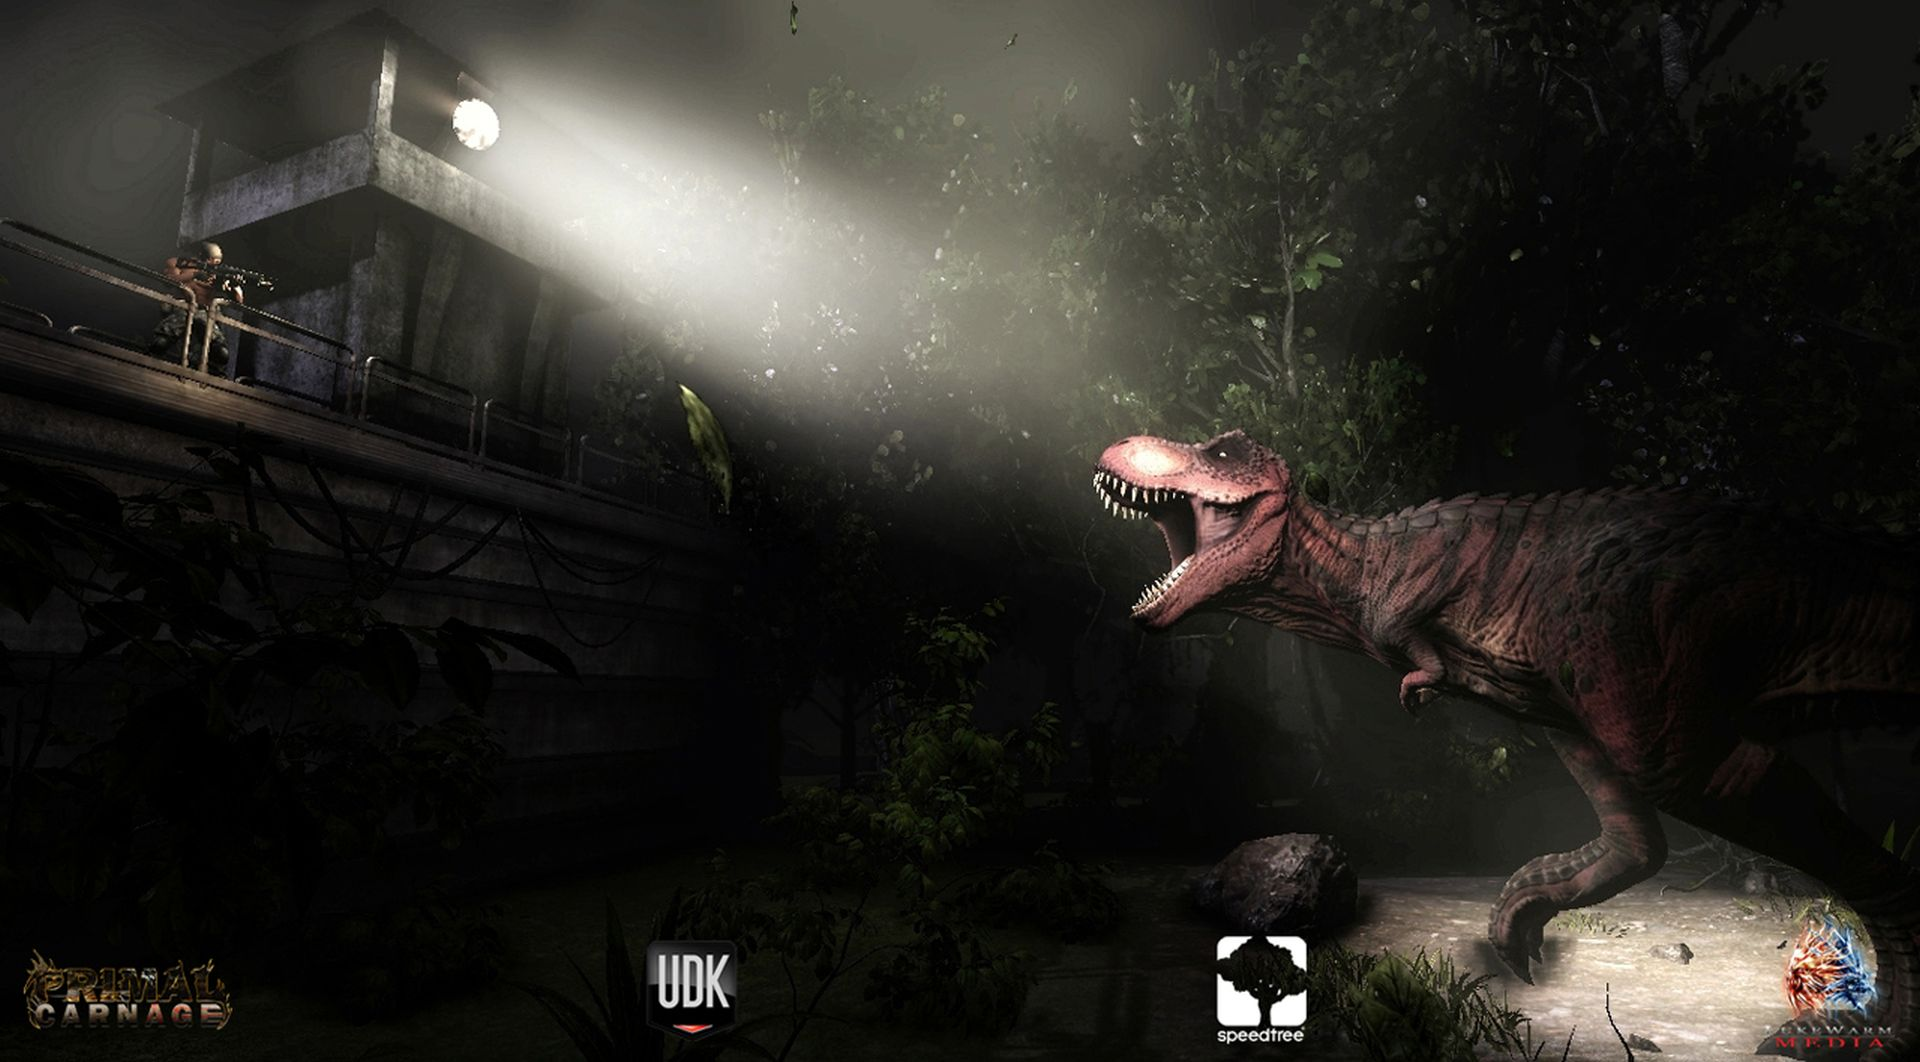 PRIMAL CARNAGE fantasy dinosaur g wallpaper 1920x1062 169026 1920x1062